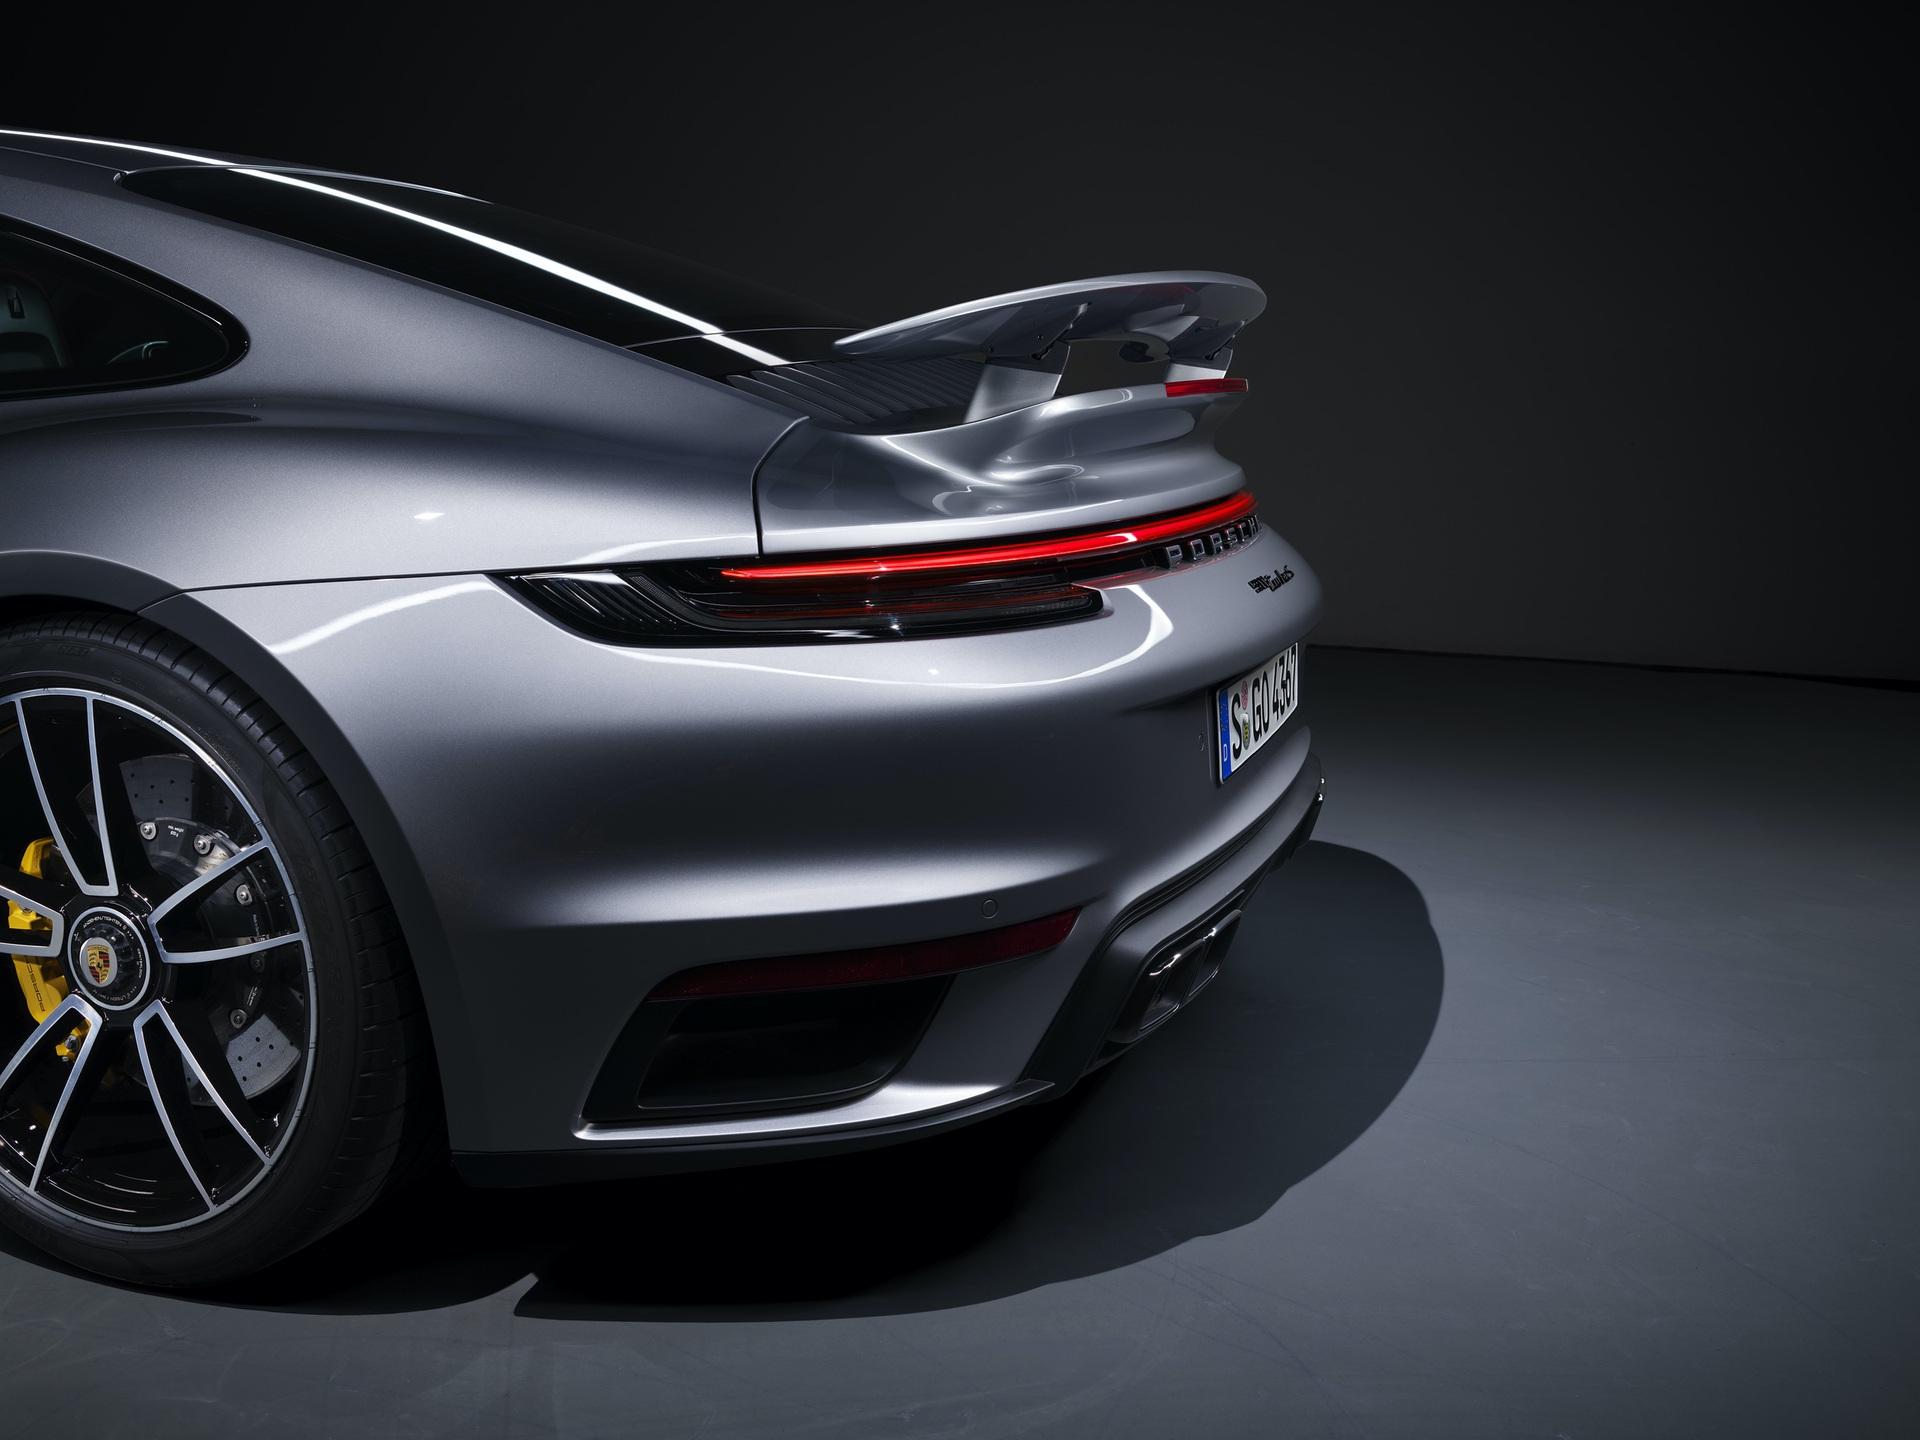 2020_Porsche_911-Turbo_S-aerodynamics_0012